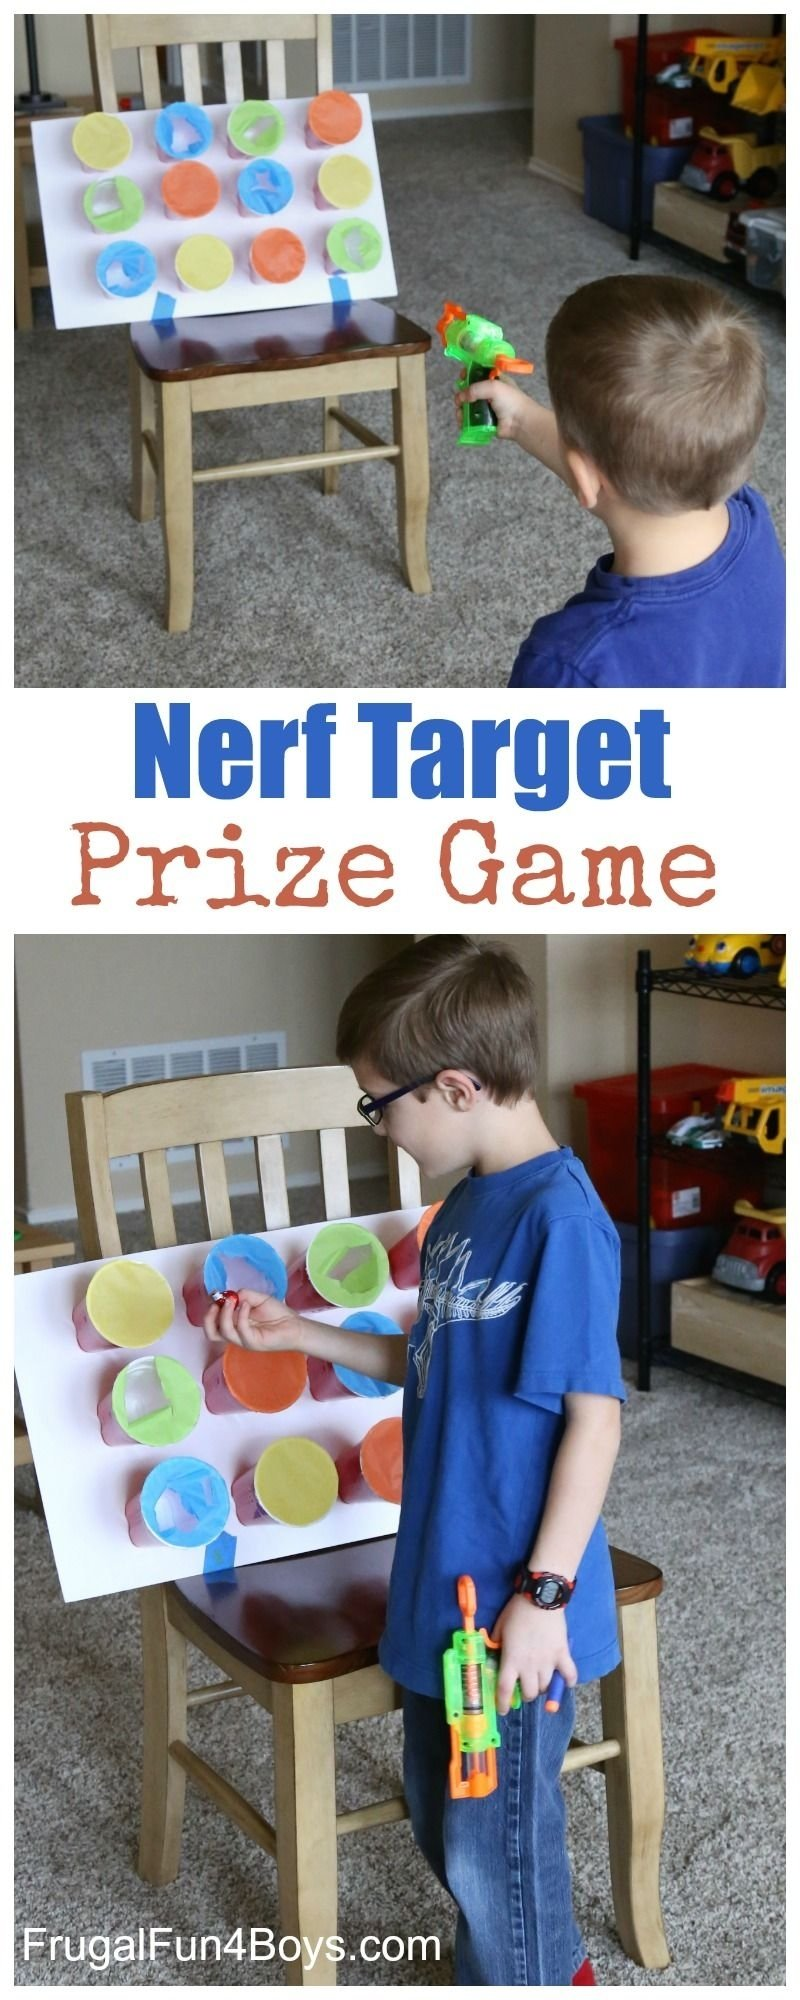 10 Fashionable Fun Game Ideas For Kids nerf target prize game fun party games party games and target 3